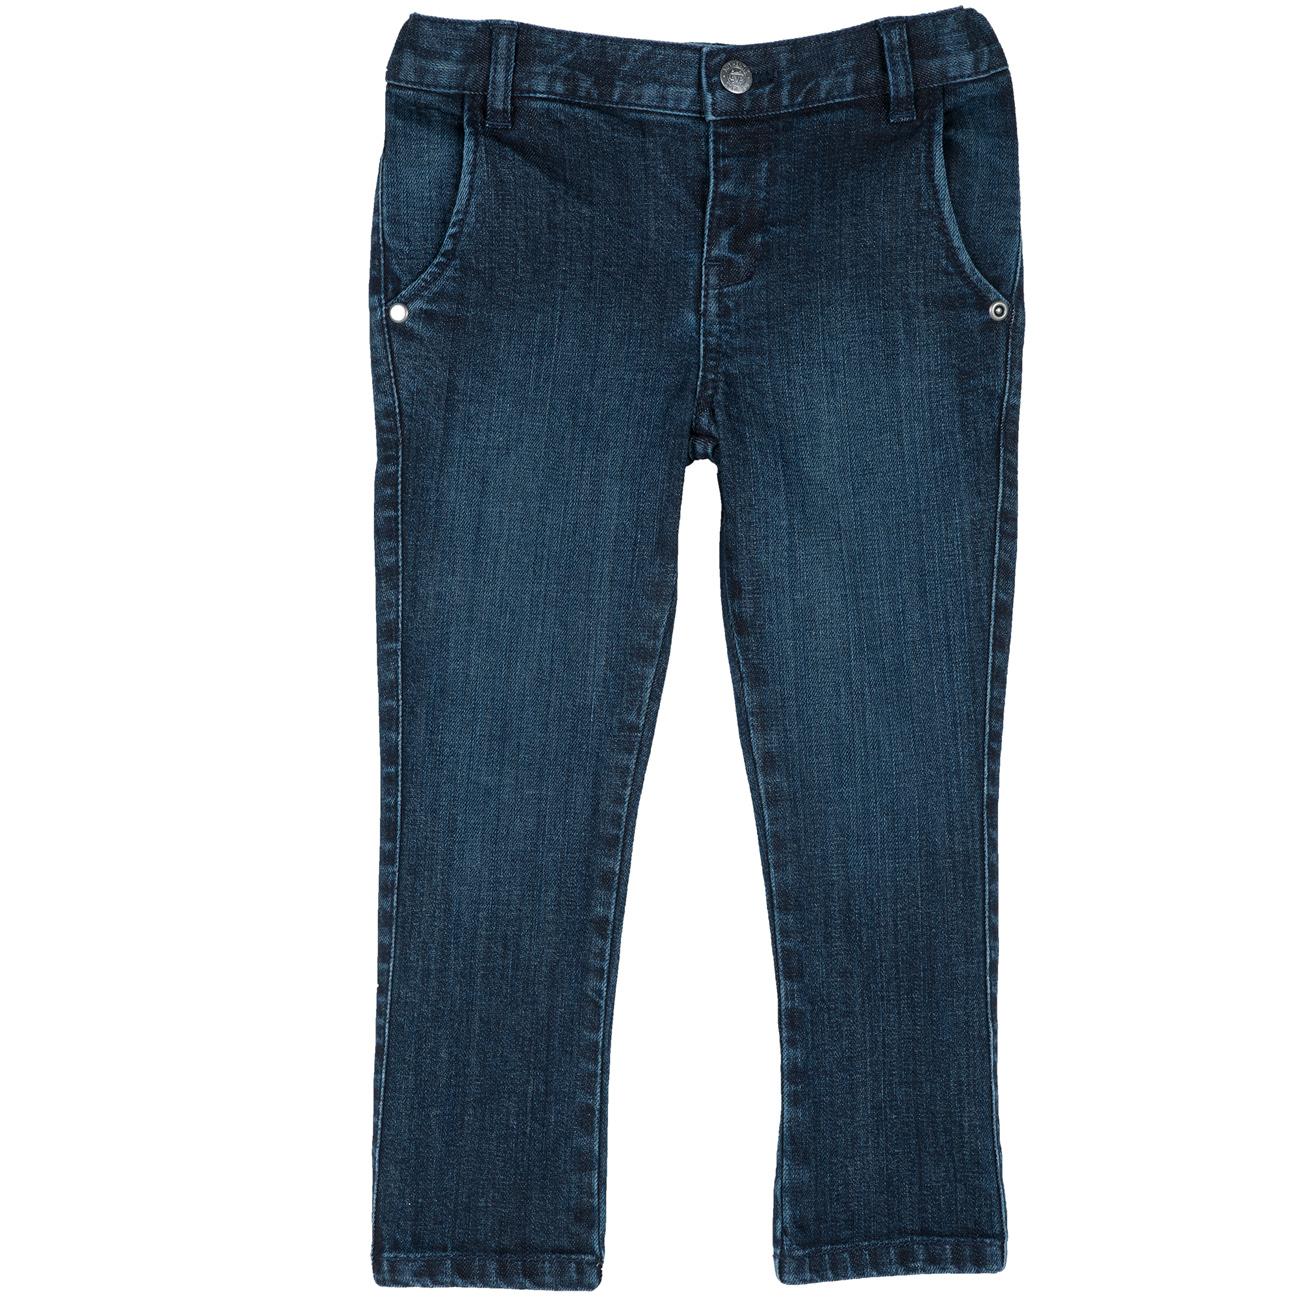 Pantaloni Jeans Copii Chicco, Albastru Inchis